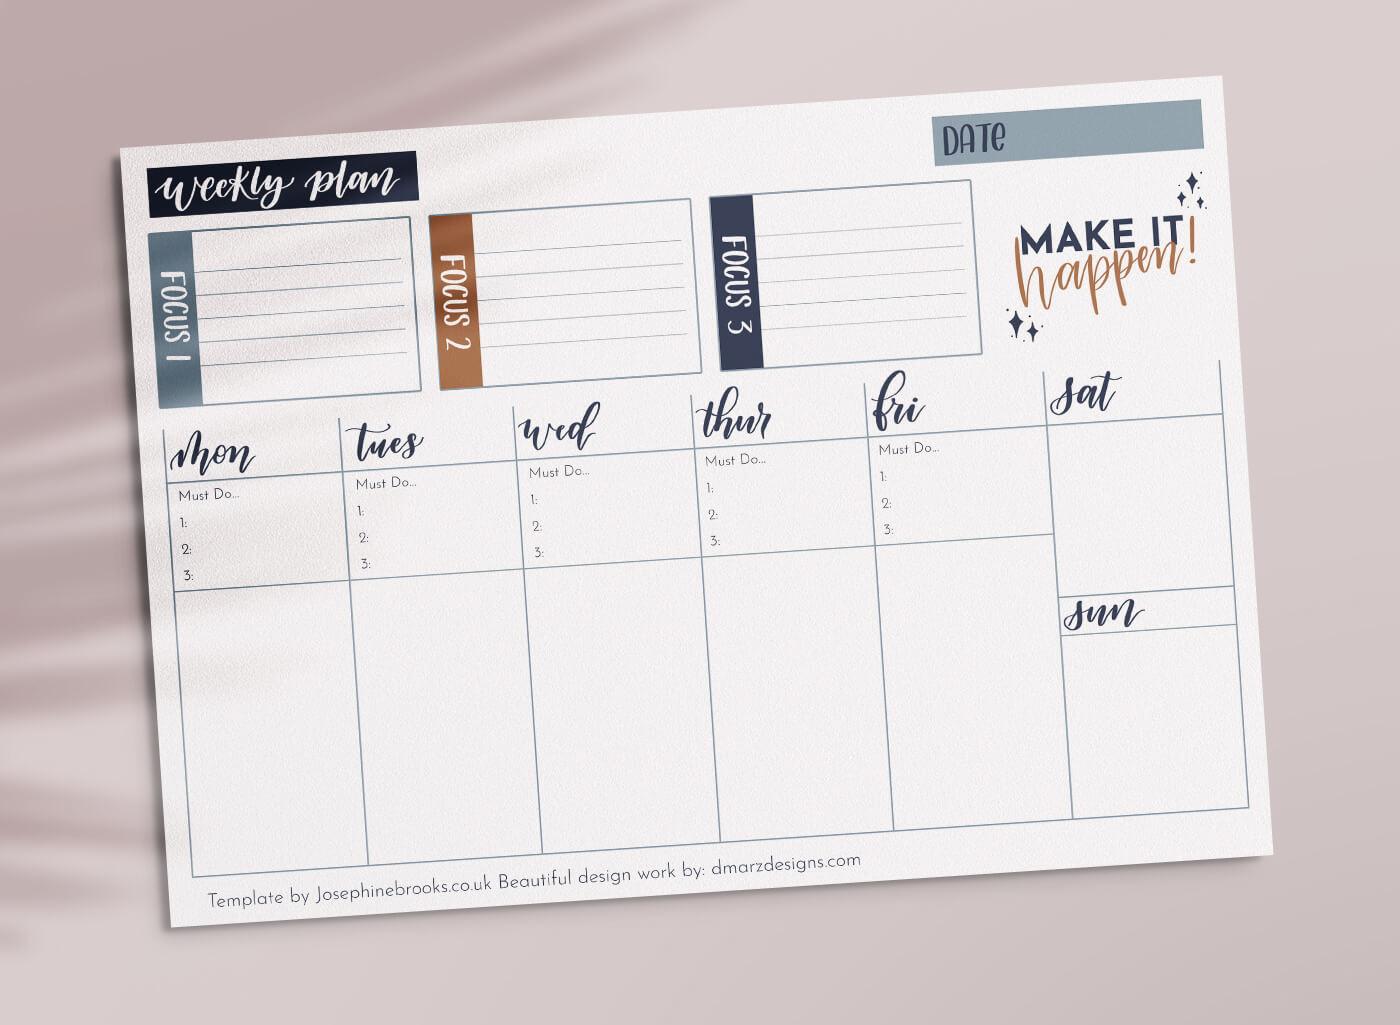 josephine-brooks-weekly-planner-design.jpg